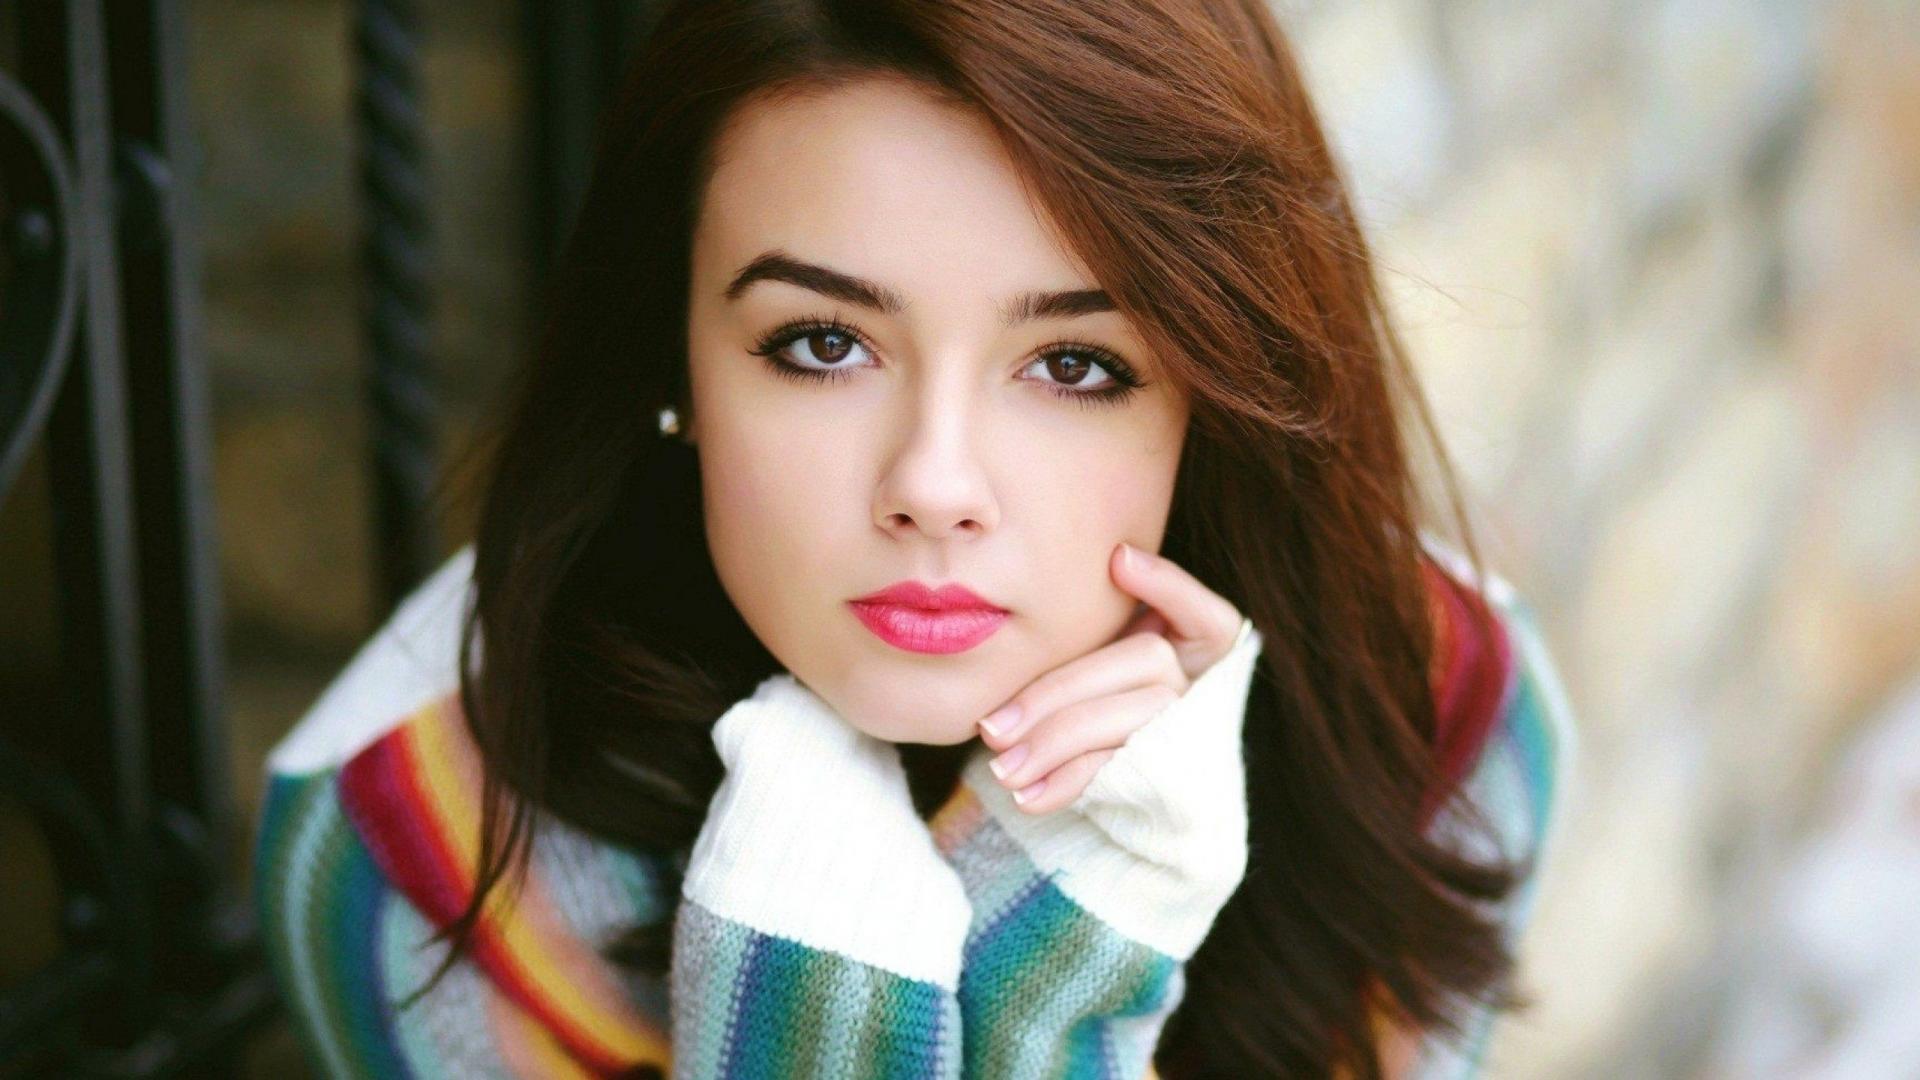 Description: Cute Girl is a hi res Wallpaper for pc desktops,laptops